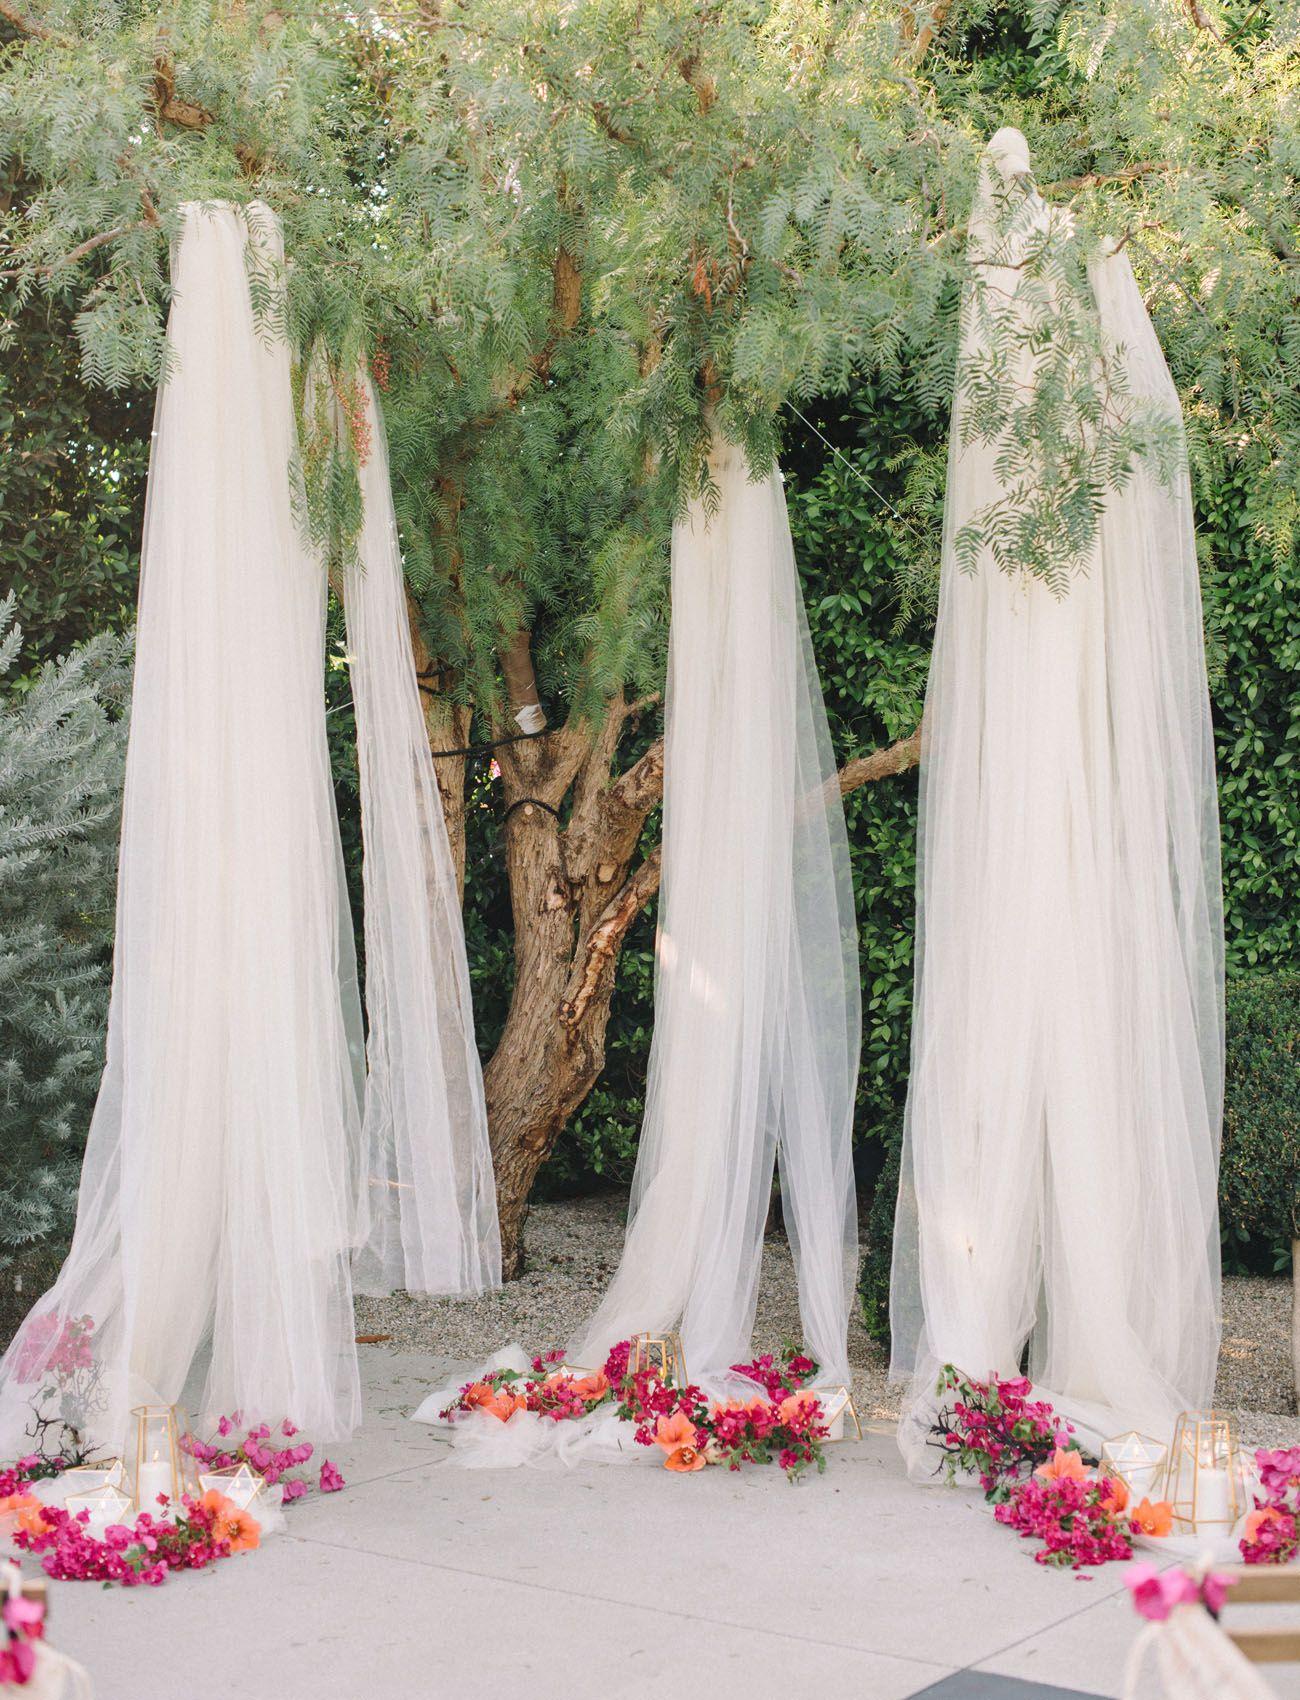 Bright + Modern Wedding Inspiration at The Fig House | Green Wedding Shoes  | Diy wedding backdrop, Outdoor wedding backdrops, Tulle wedding decorations